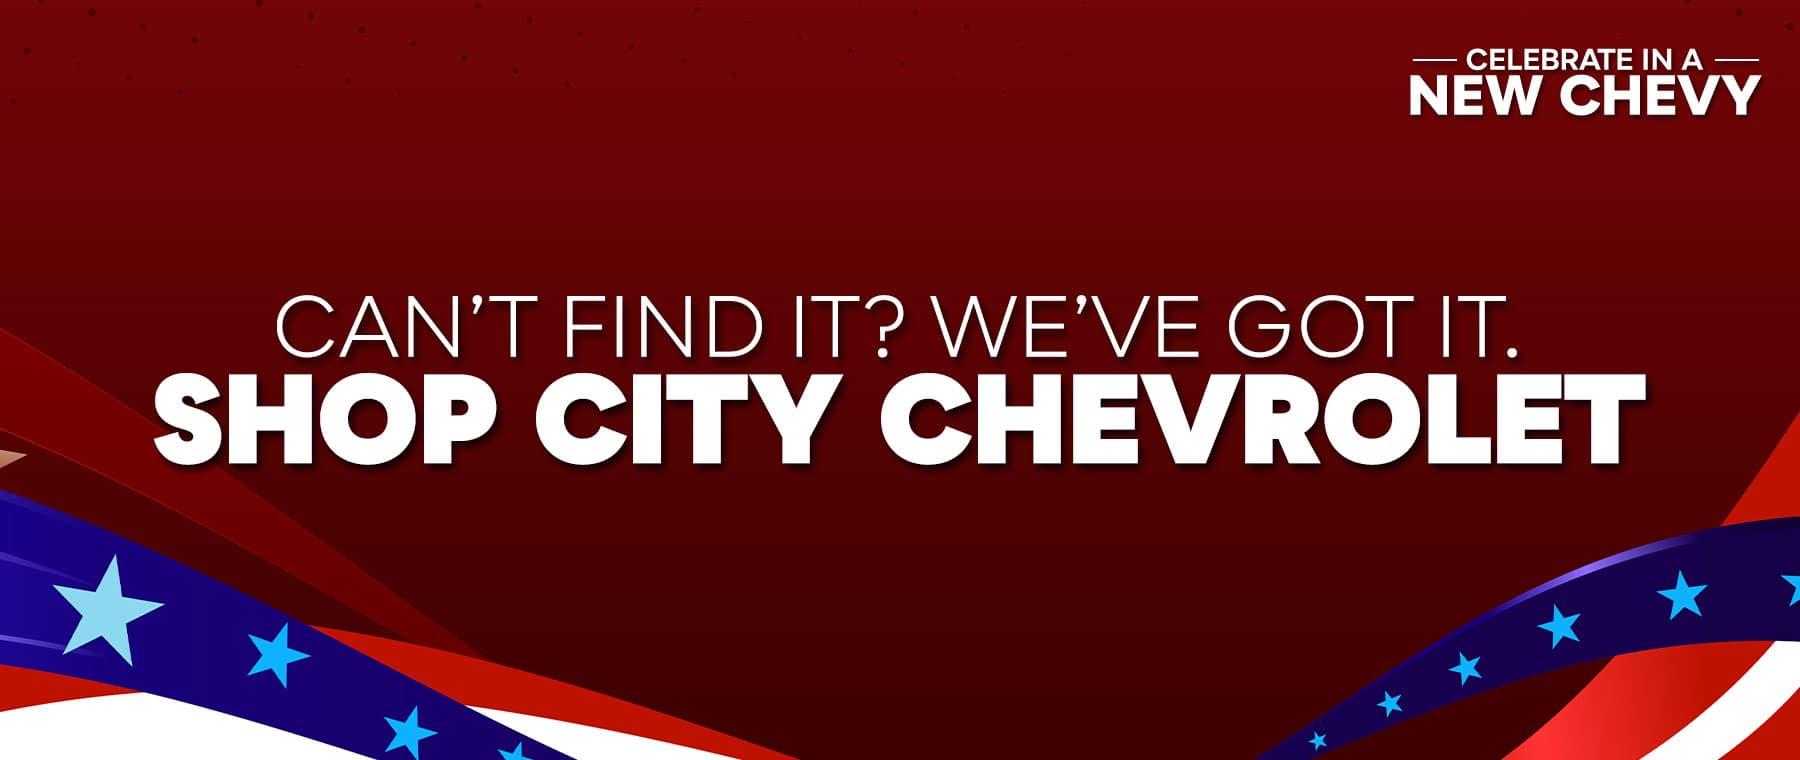 shop at city chevrolet